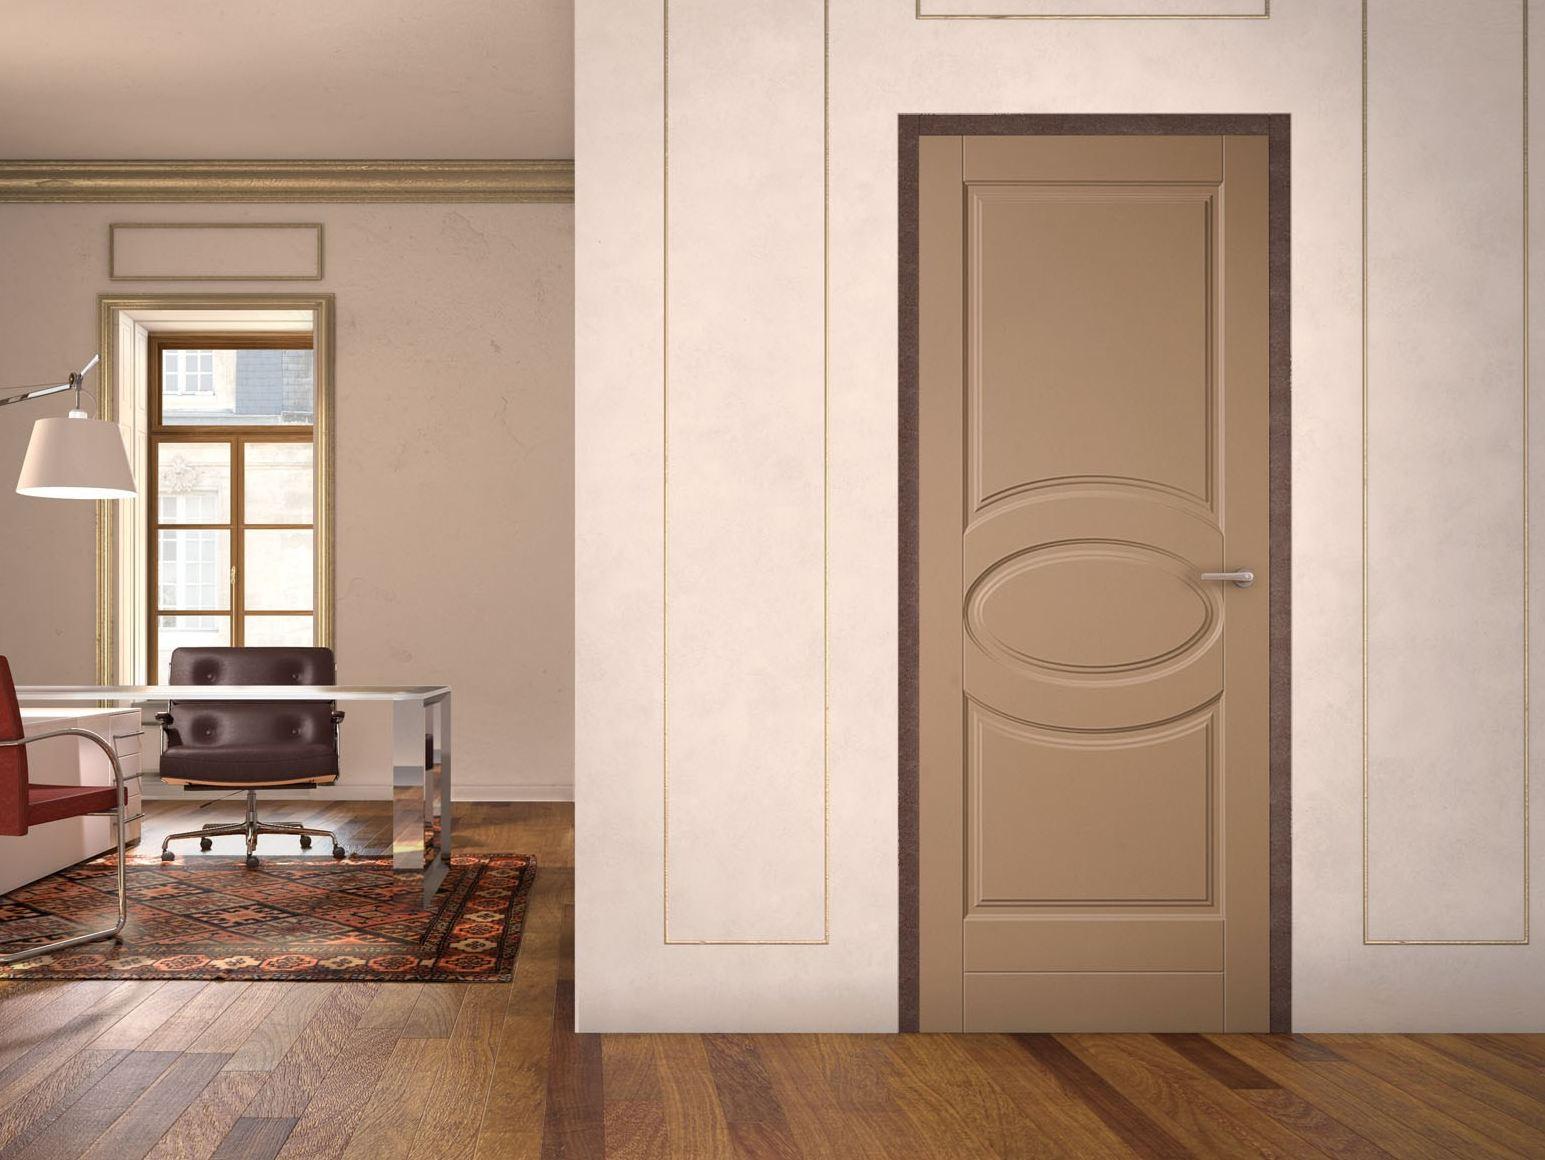 neko-entry-door-with-concealed-hinges-arcadia-componibili-gruppo-penta-237746-rel6b0ab14